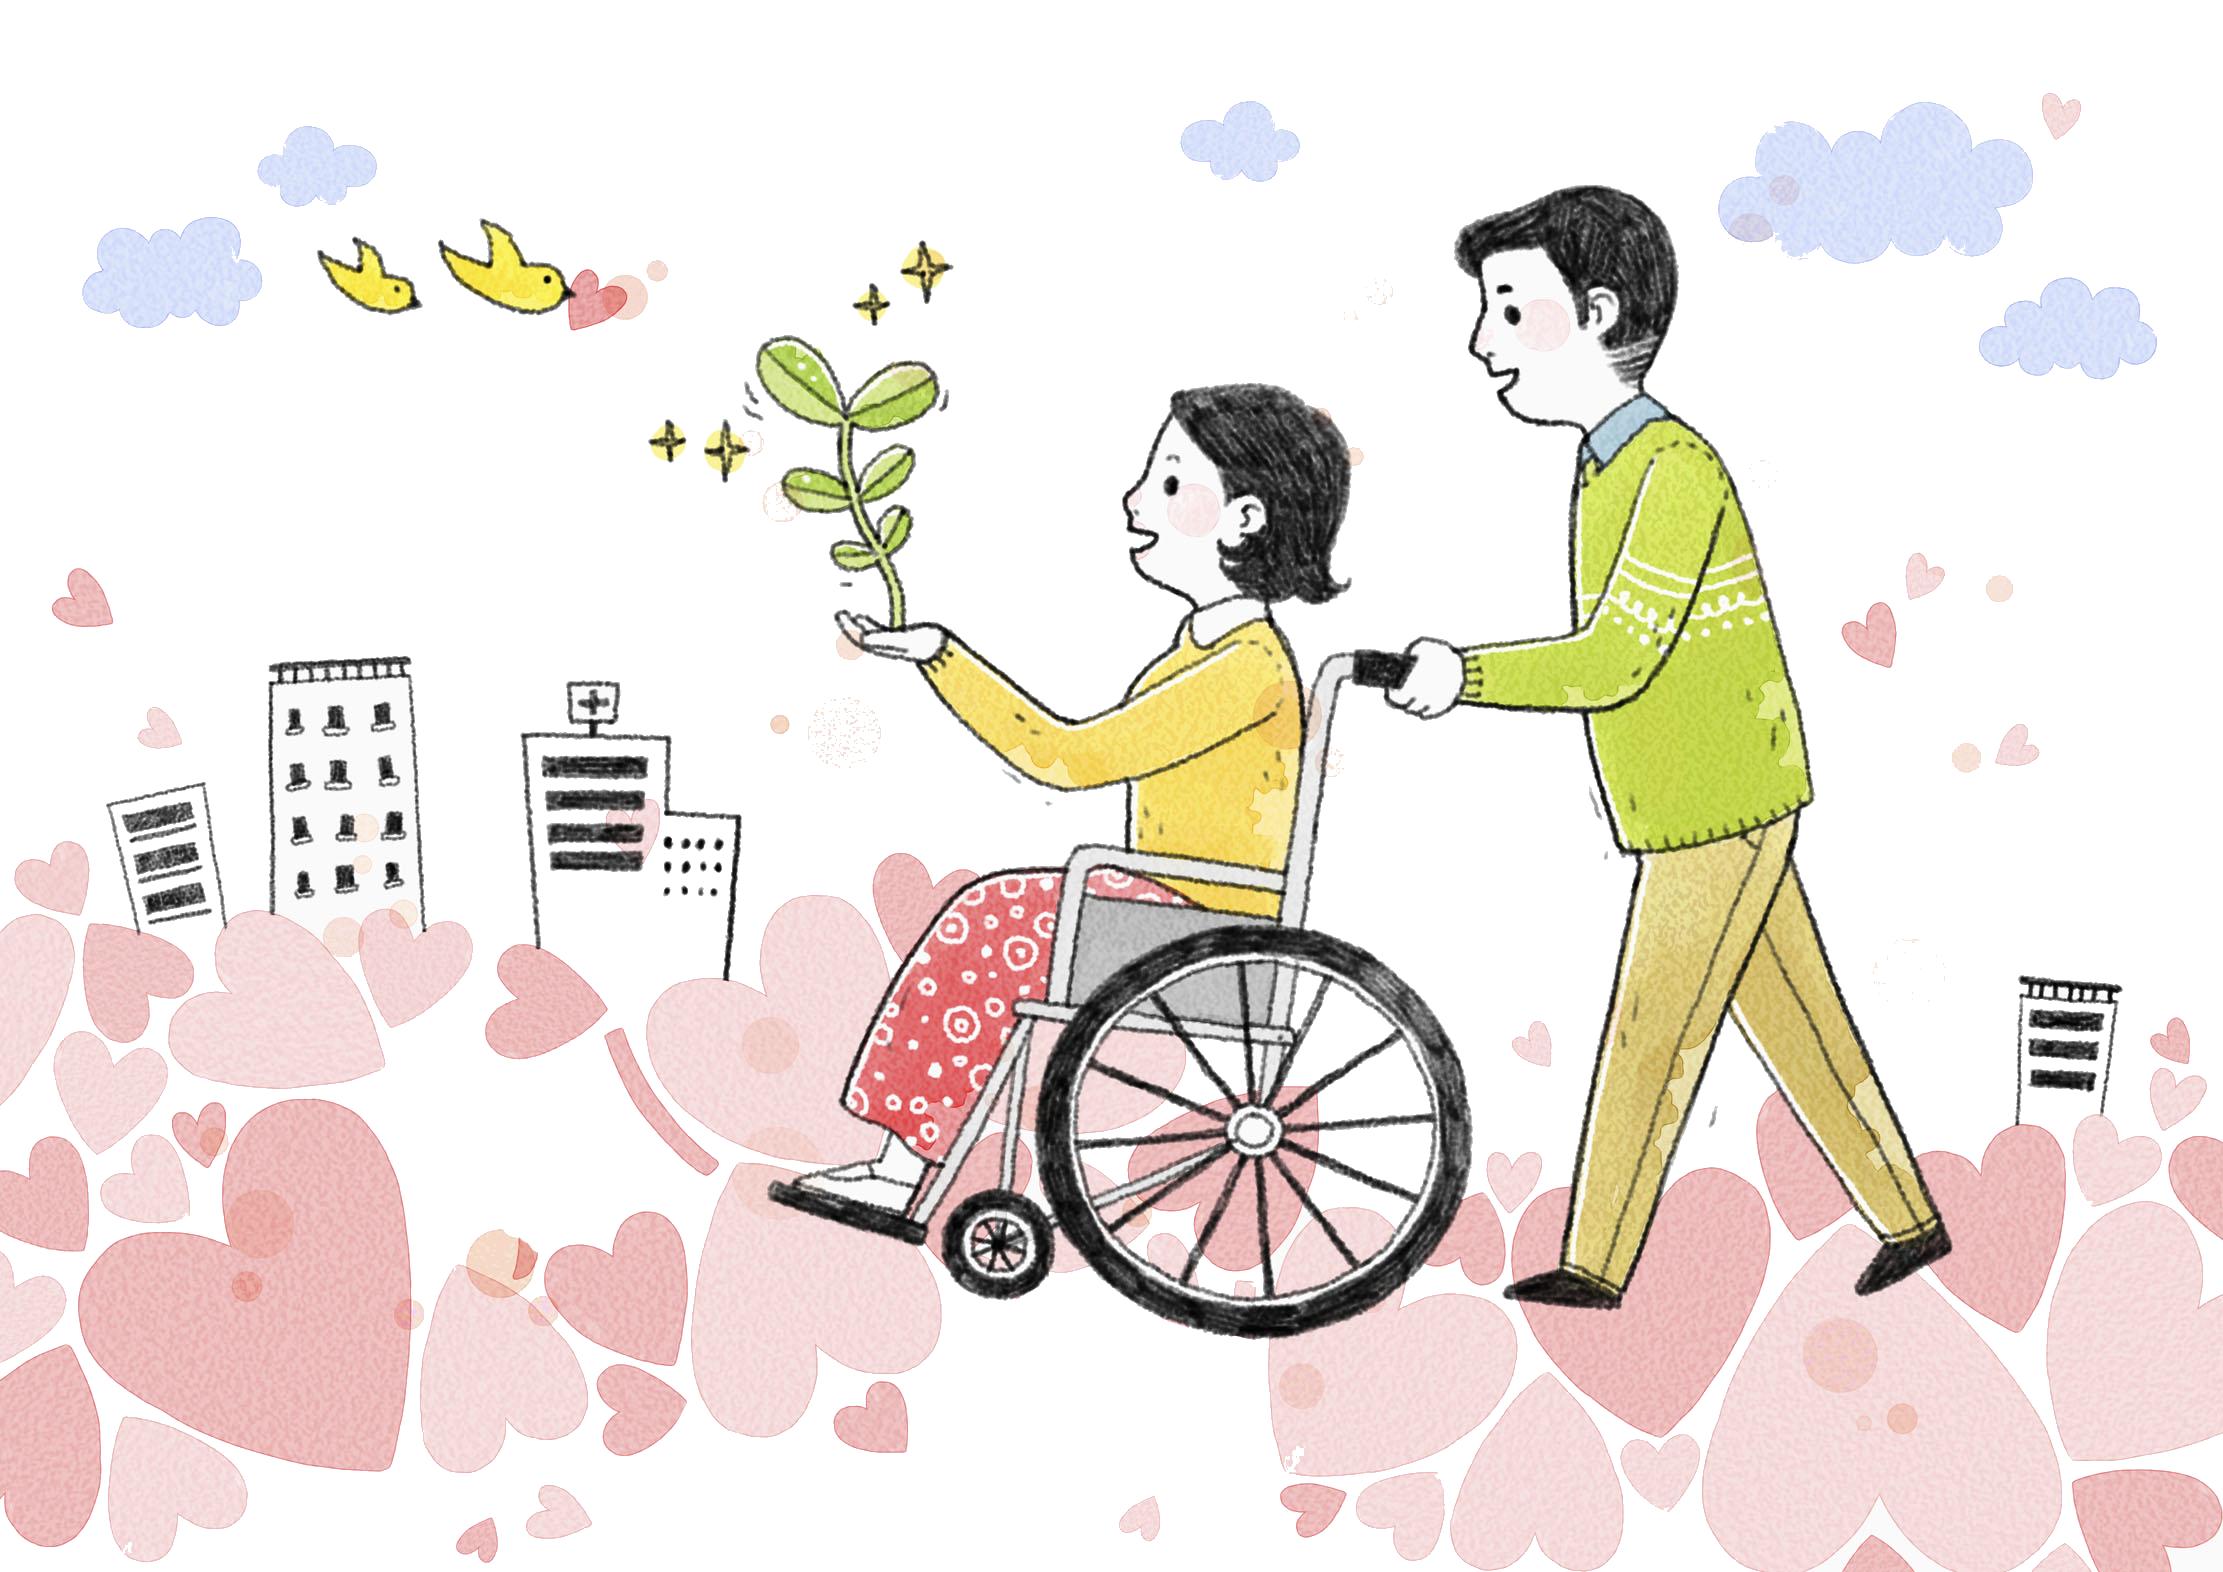 Injury clipart disability person. Dangjin wheelchair april international